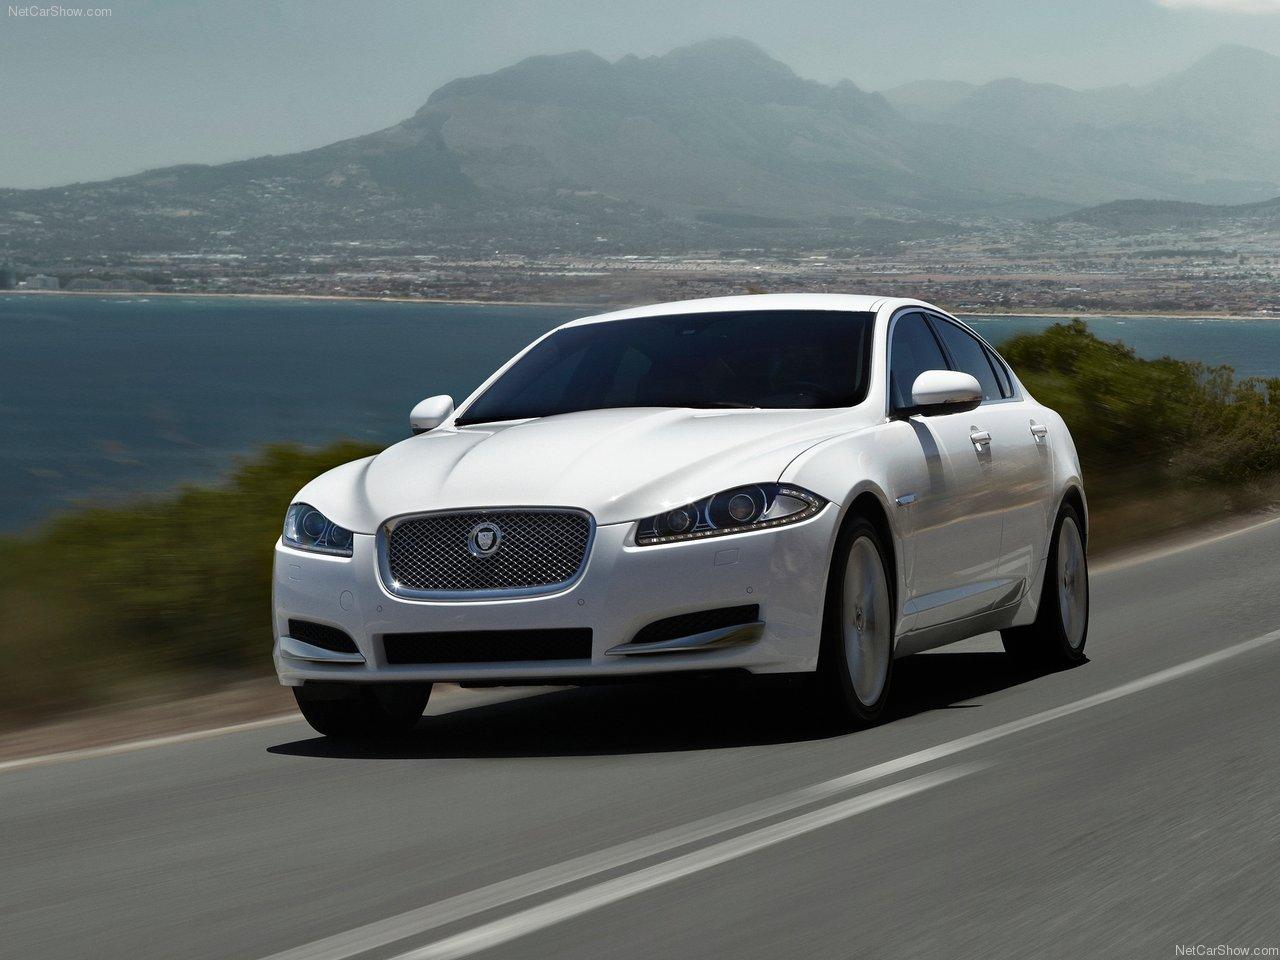 Jaguar XF 2012 Wallpaper Desktop Background